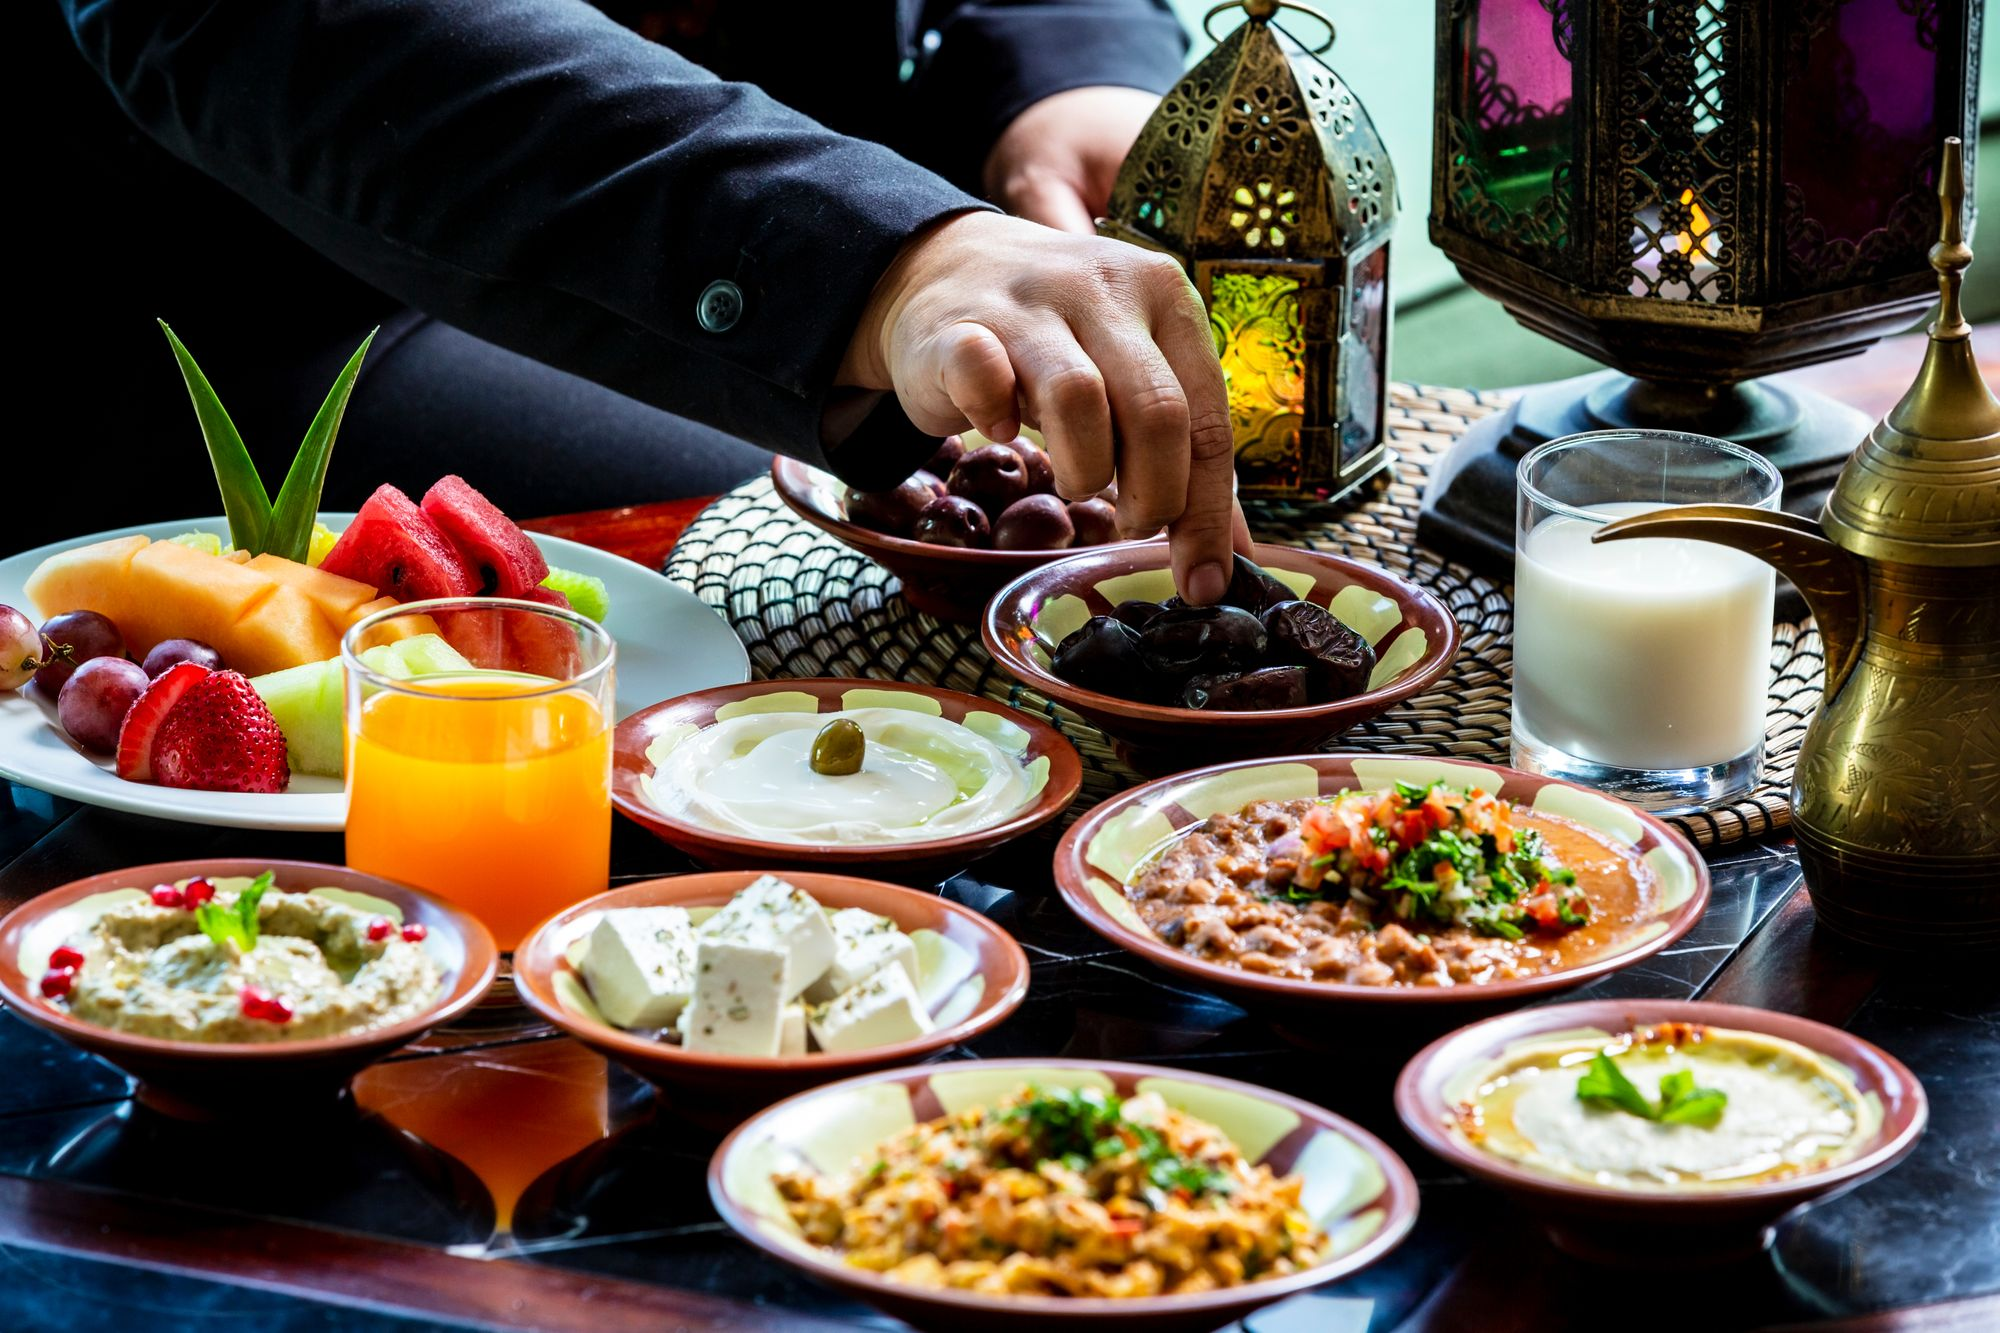 Iftar-Mahlzeit